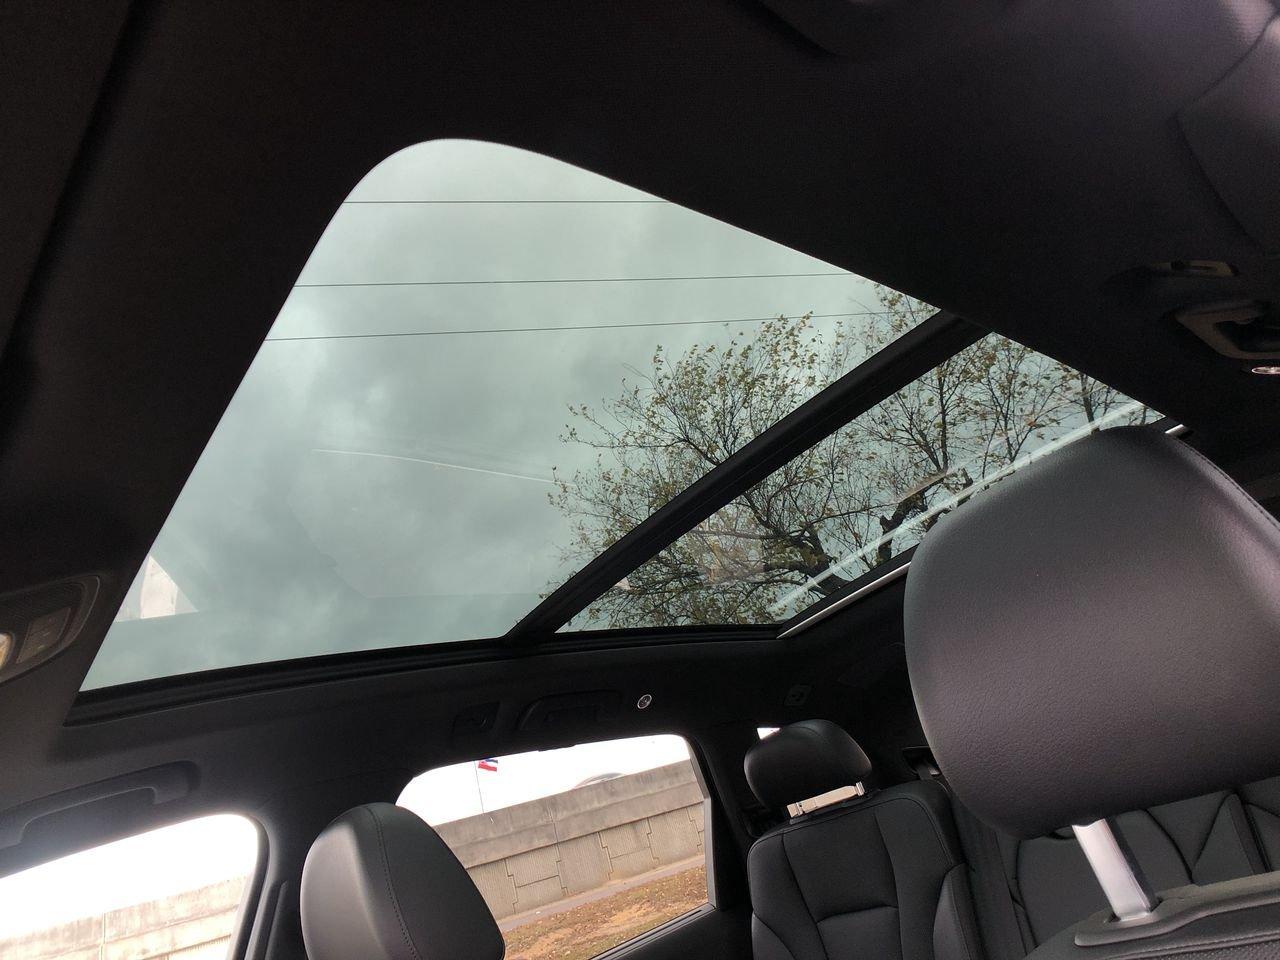 New 2019 Audi Q7 For Sale at Audi Jackson | VIN